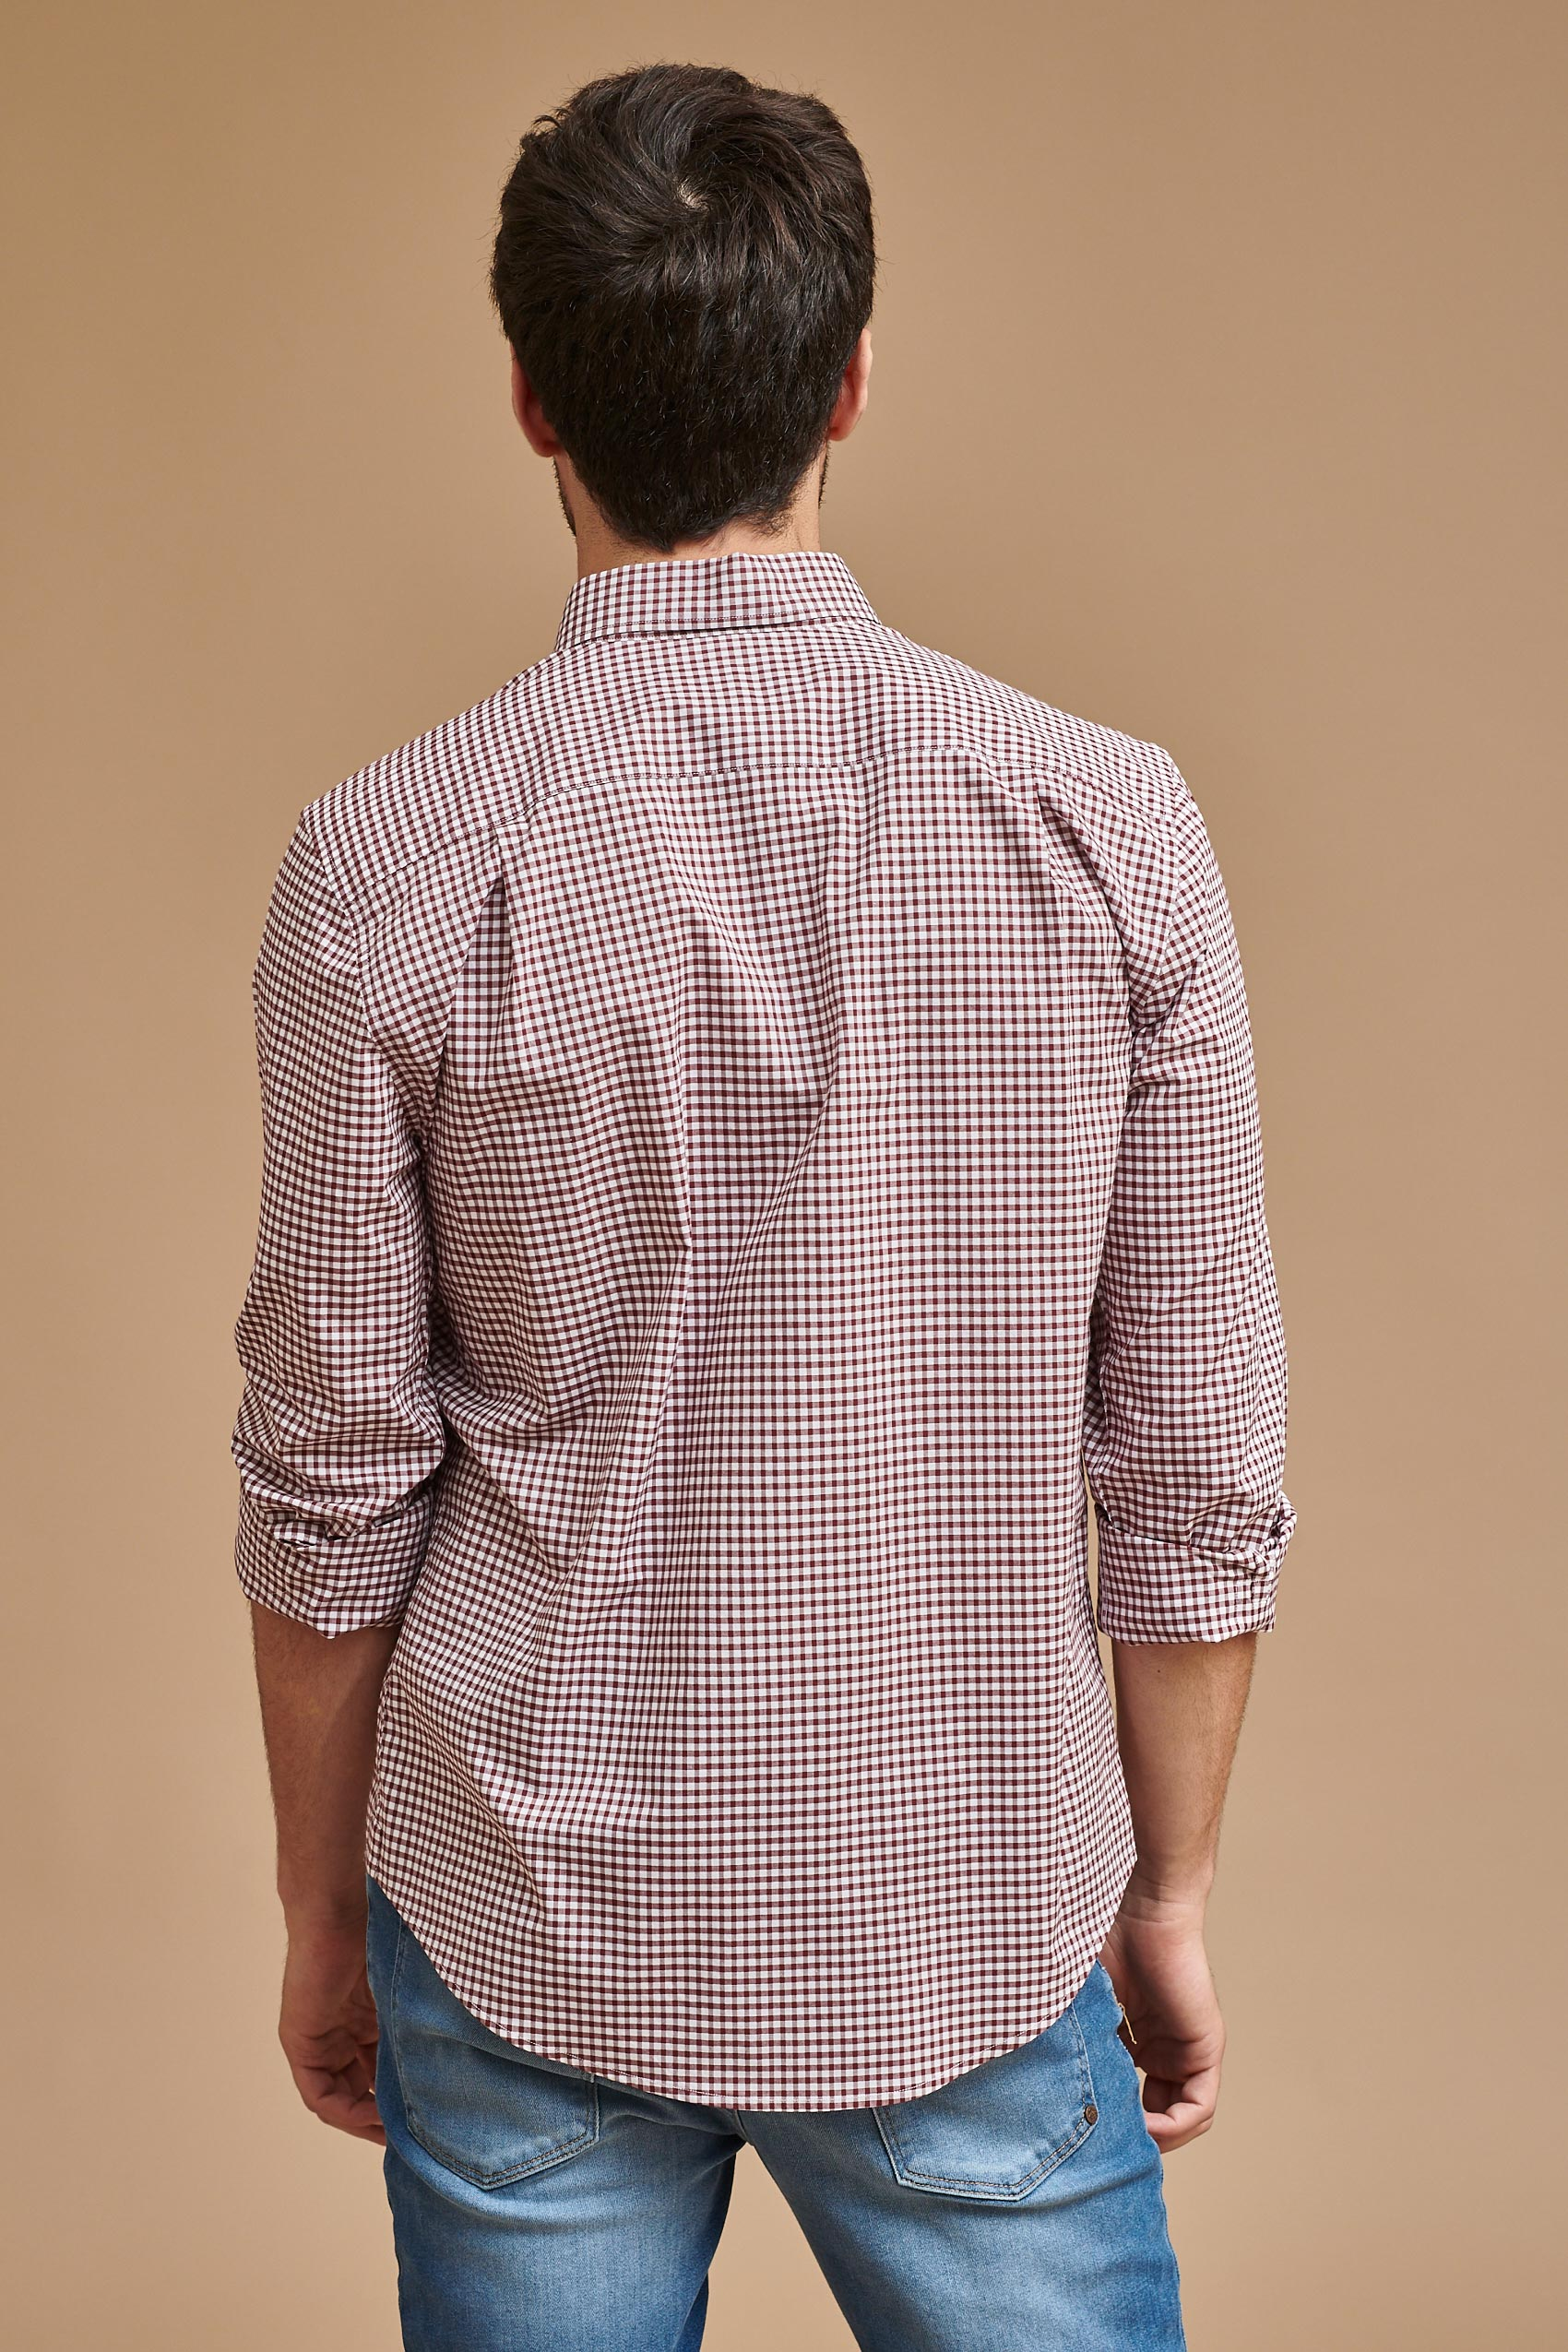 penguin_ls-gingham-shirt-b/d_00-14-2020__picture-14980